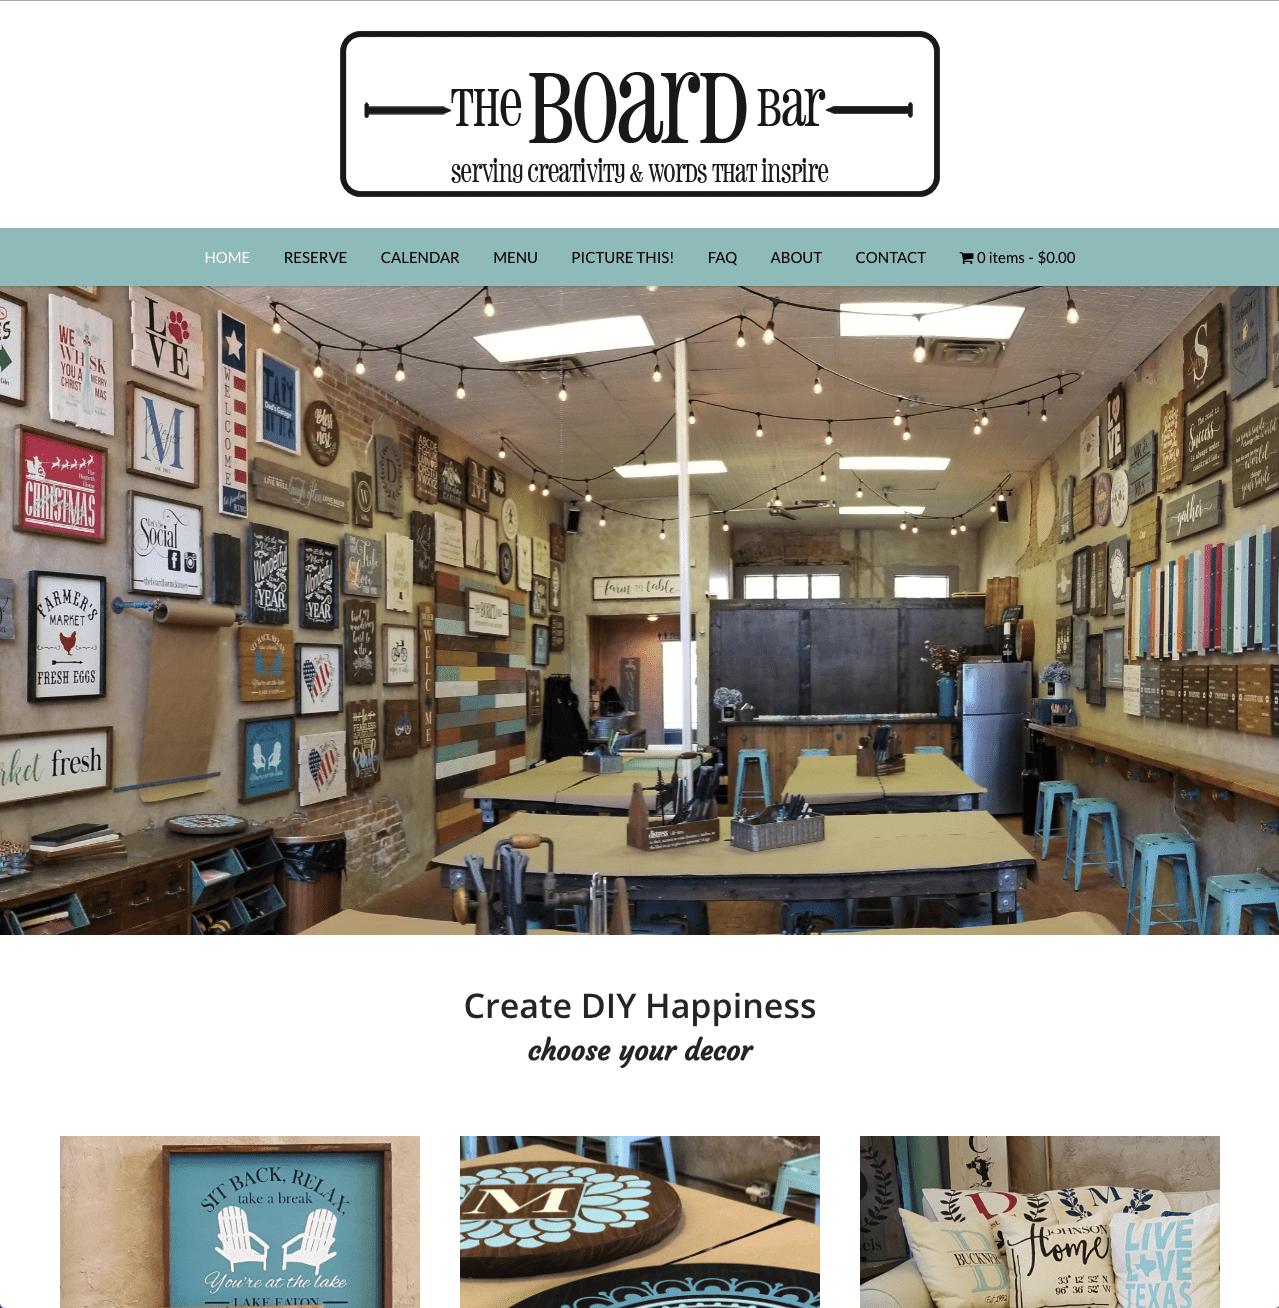 theboardbar.com